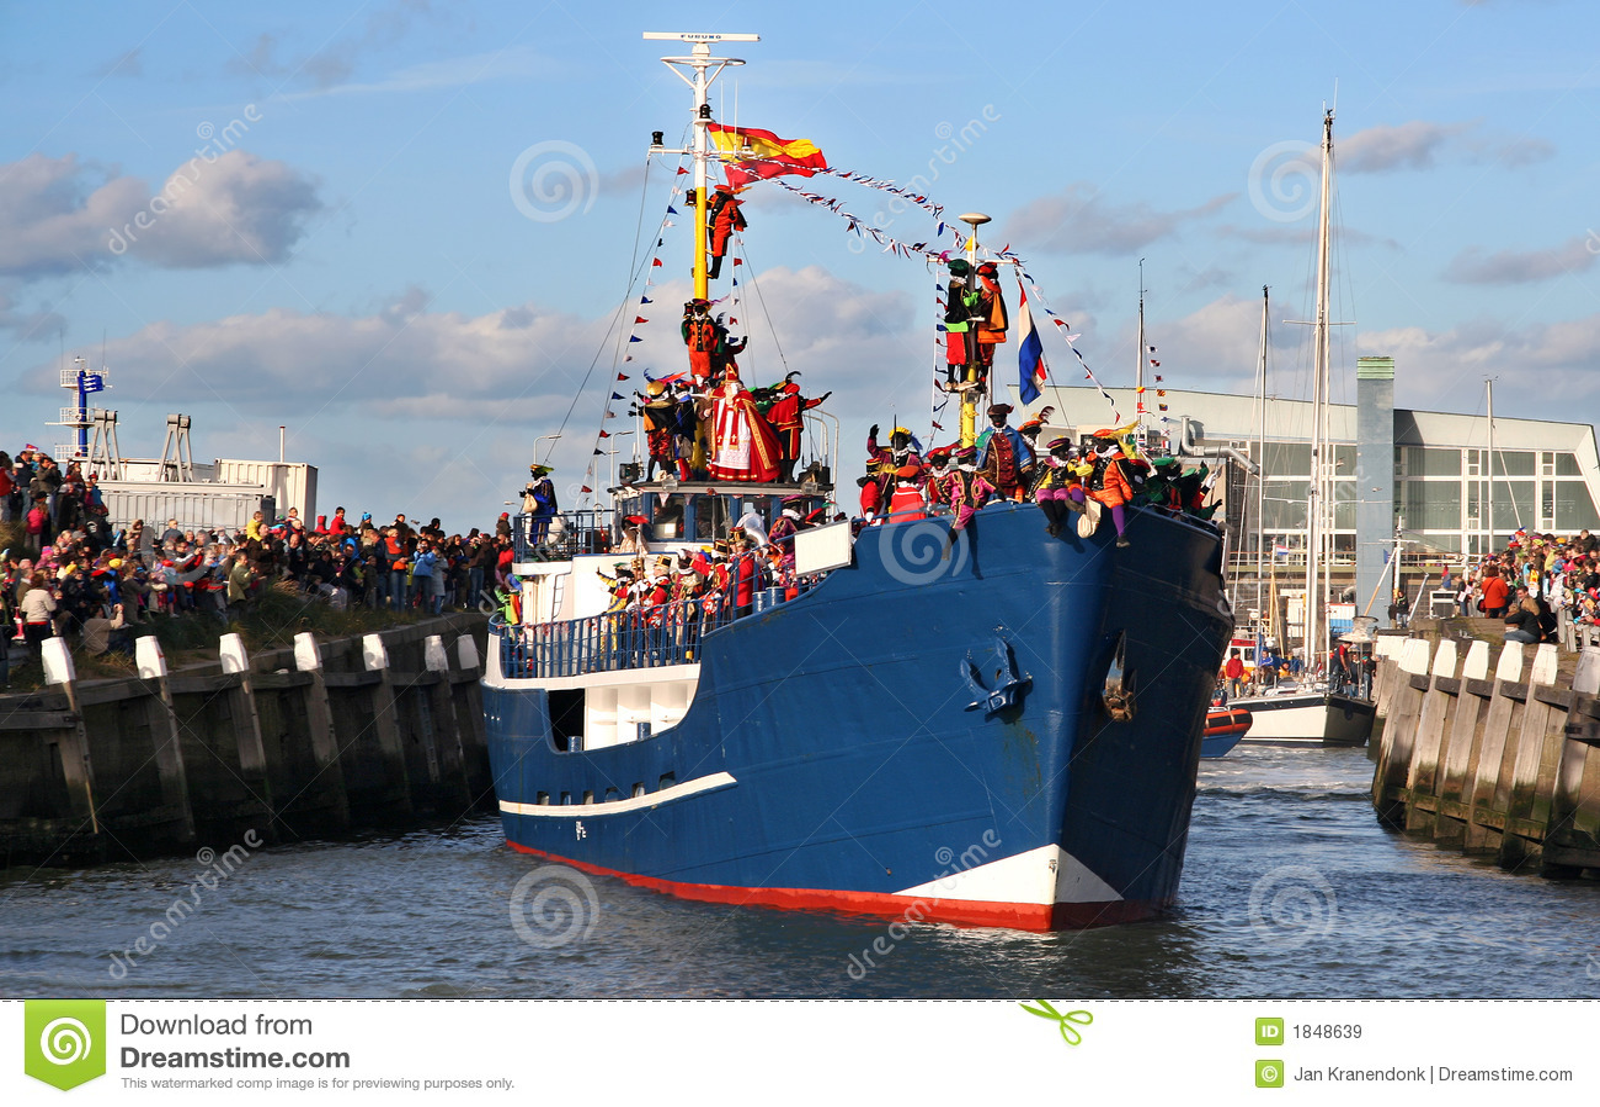 Santa Claus comes to Holland